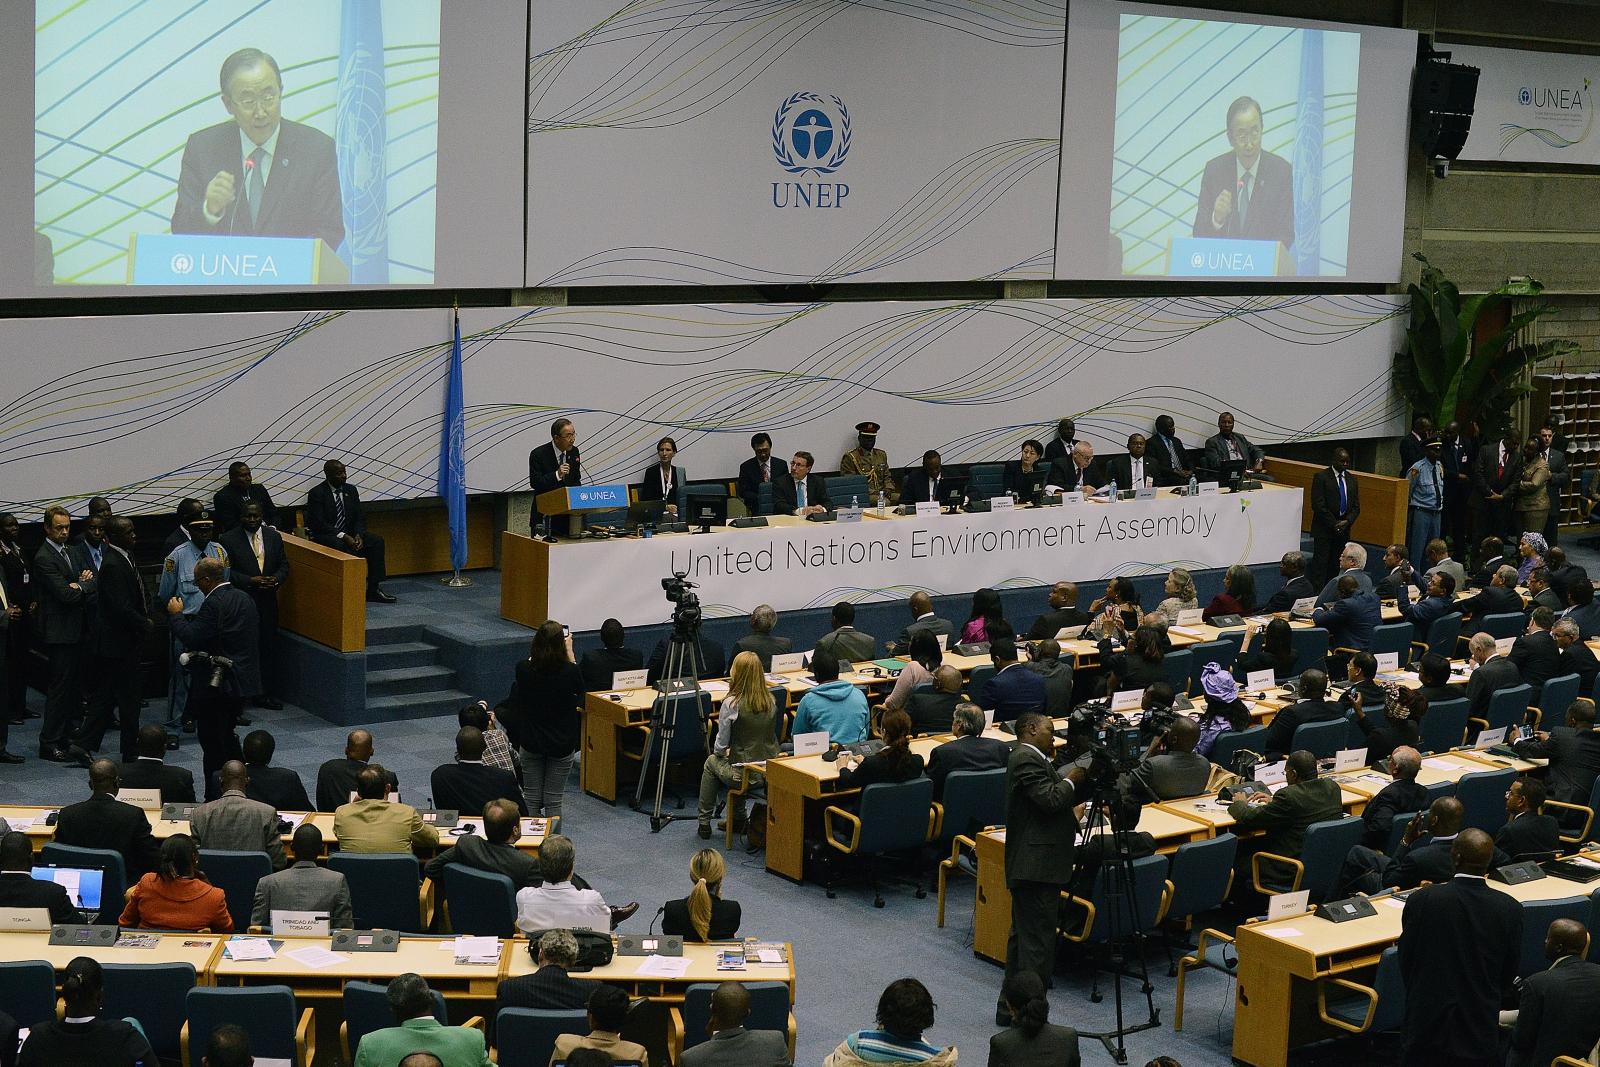 UN Environmental Assembly